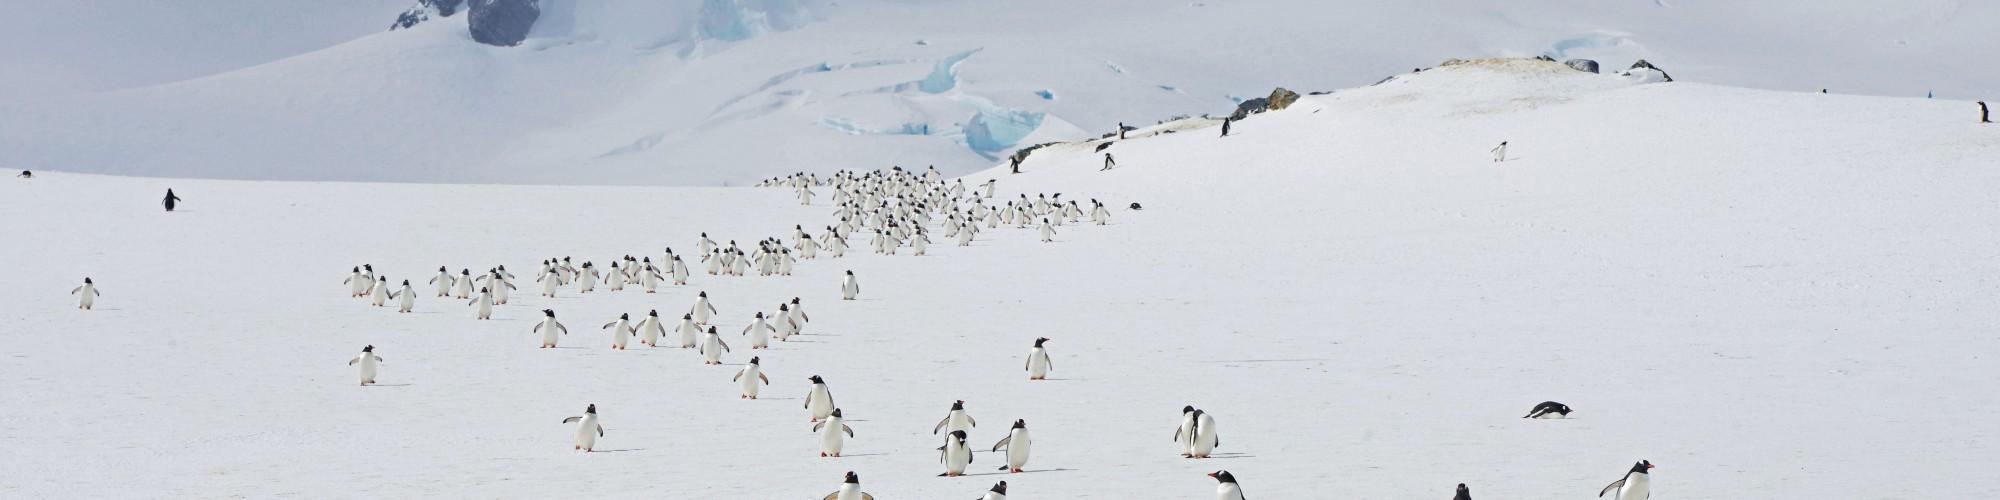 Antarctica - Peninsula - Hebridean Sky - Penguins